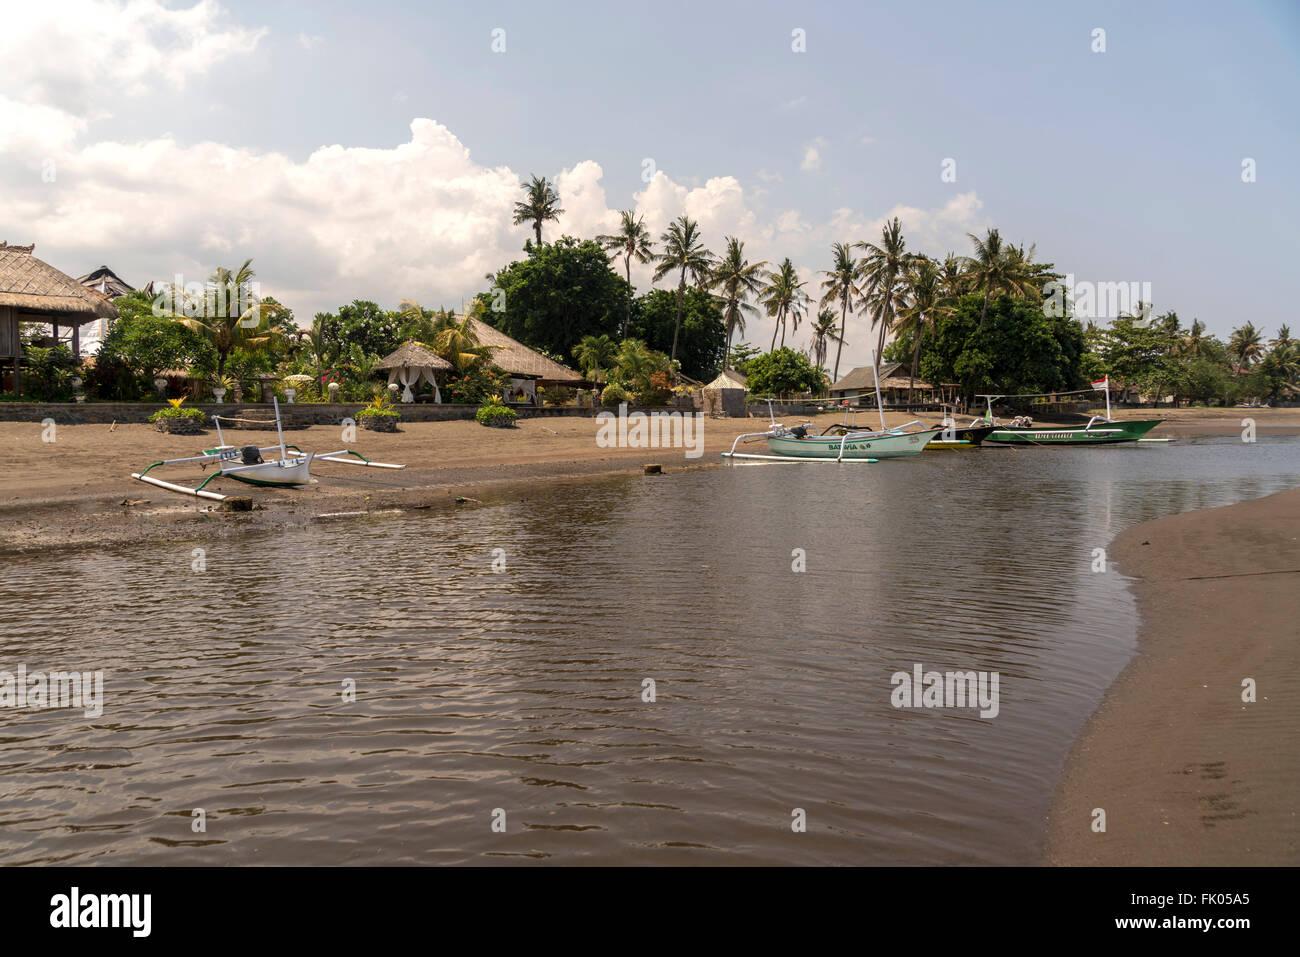 Sandy Beach, Lovina Lovina, Bali, Indonesia Imagen De Stock